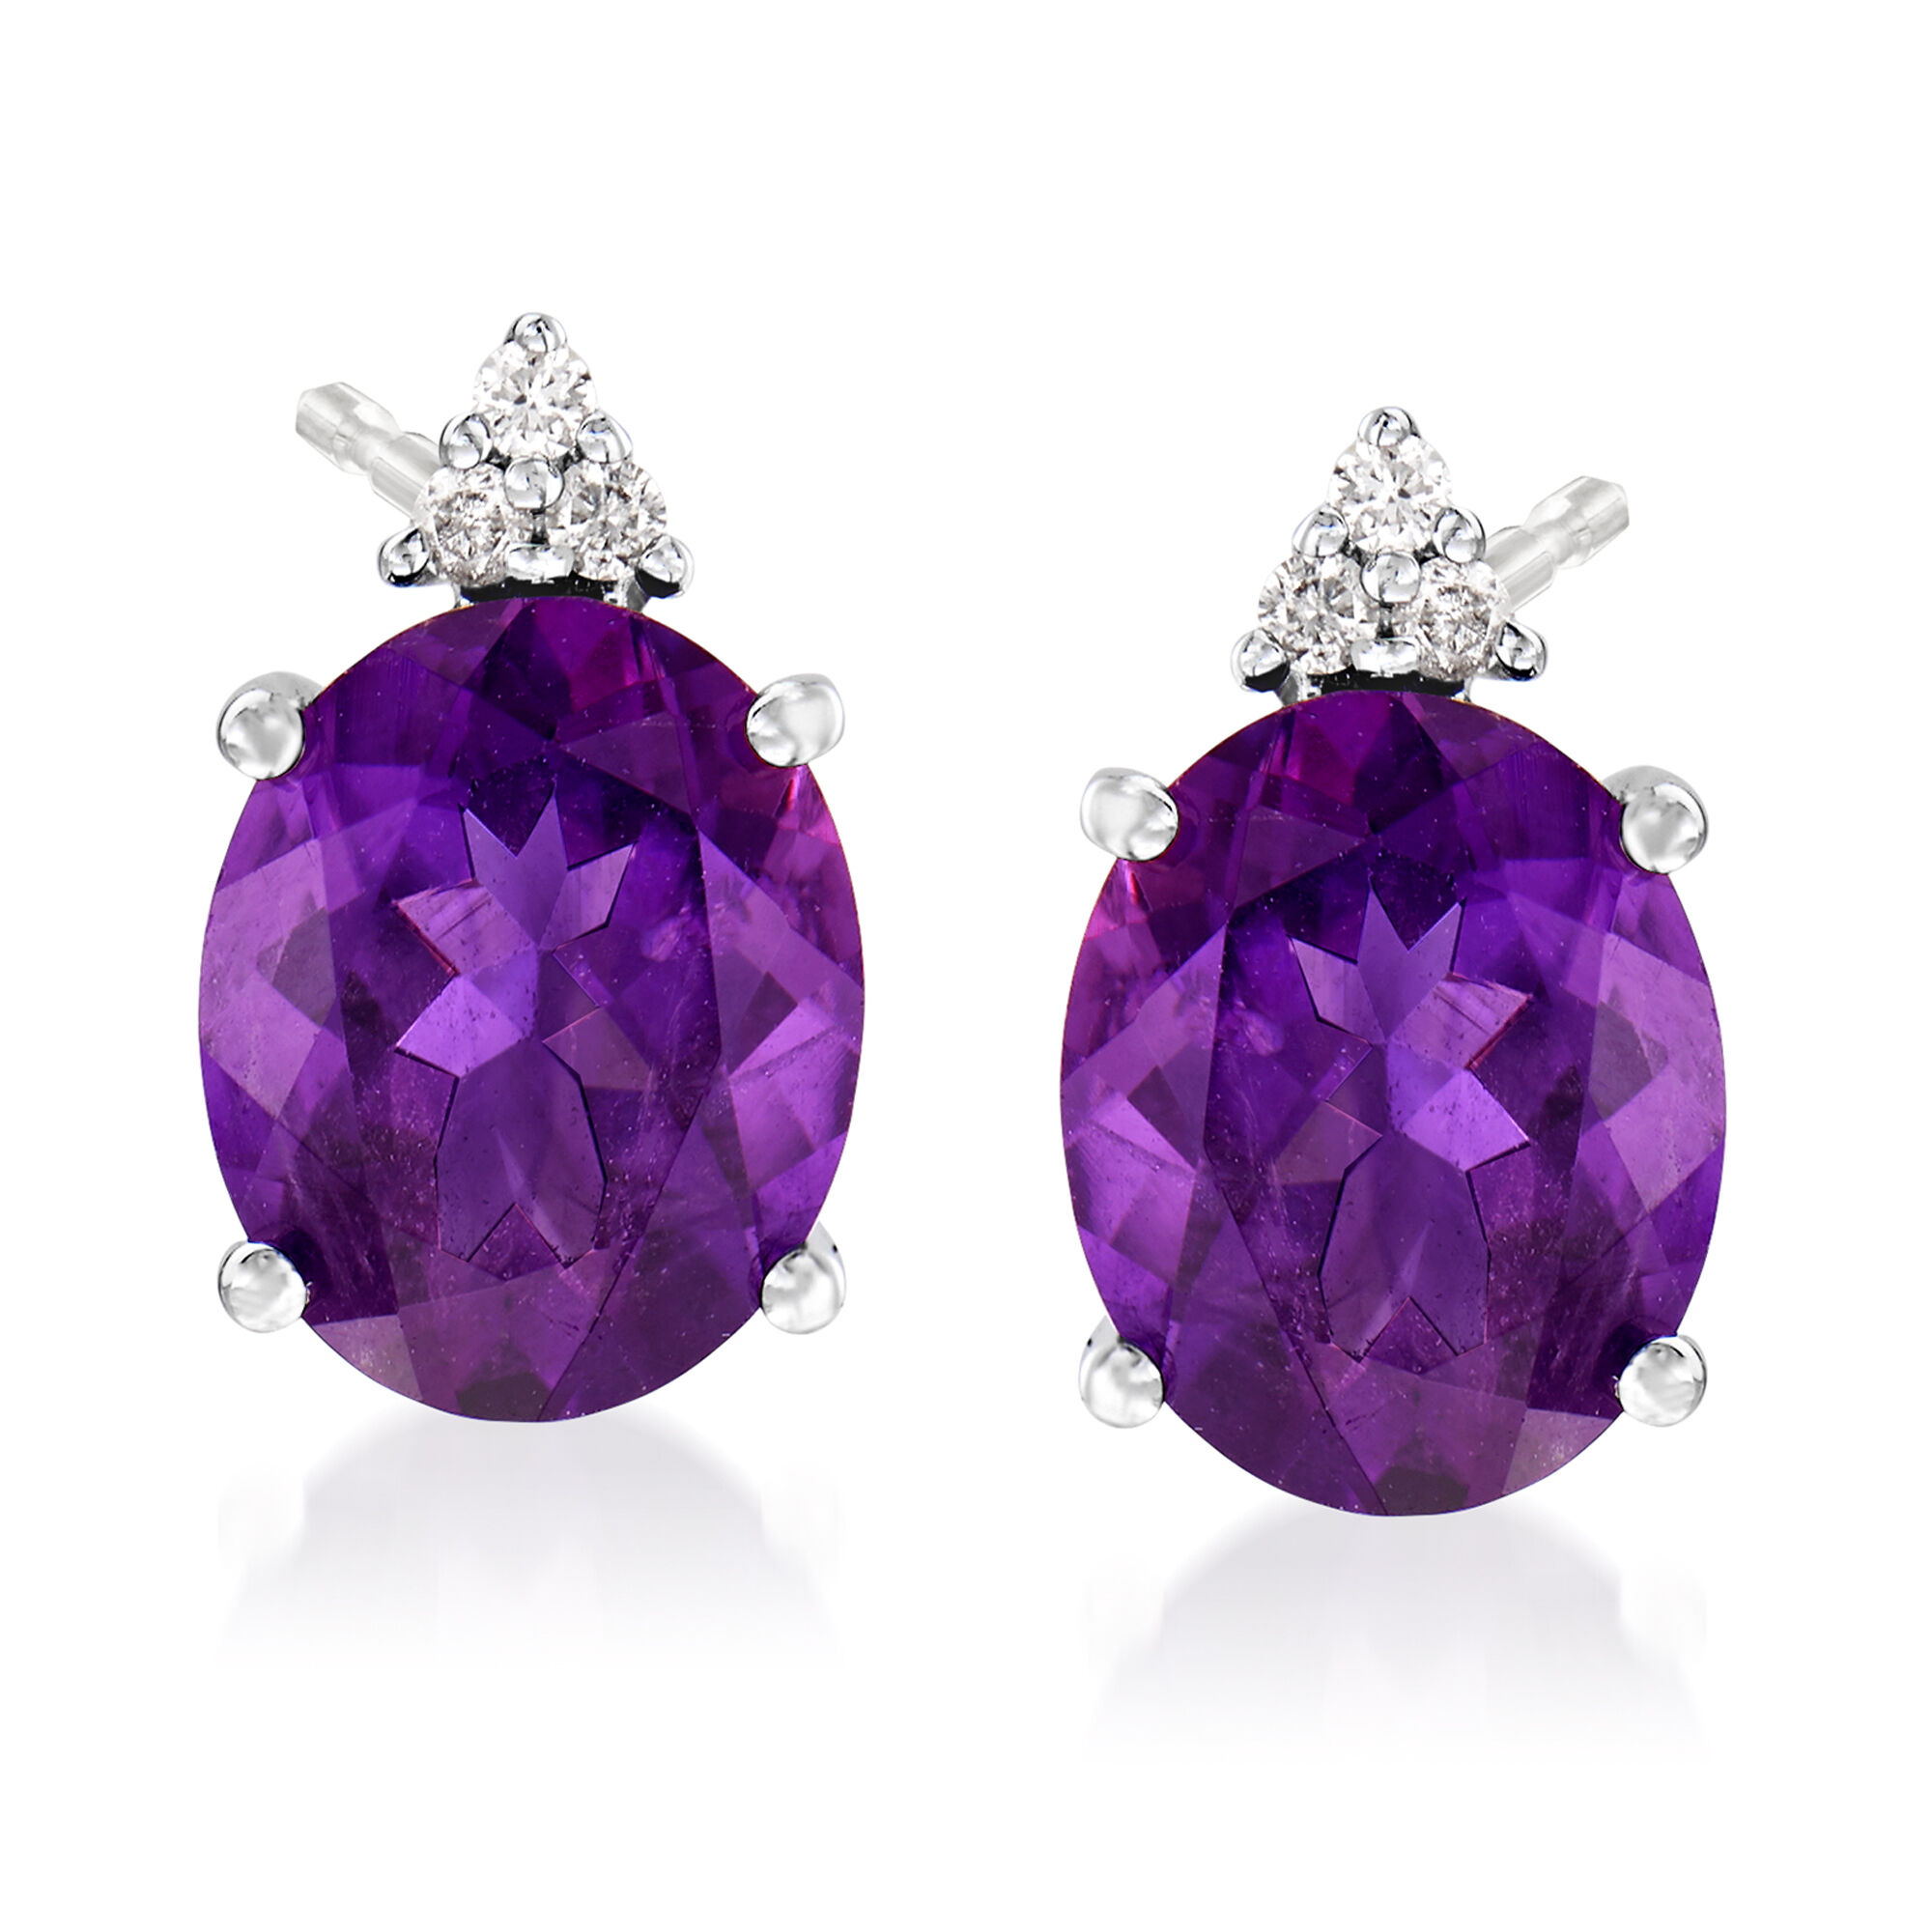 1.65 Ct Oval Purple Amethyst Gold Plated Silver Pendant Earrings Set